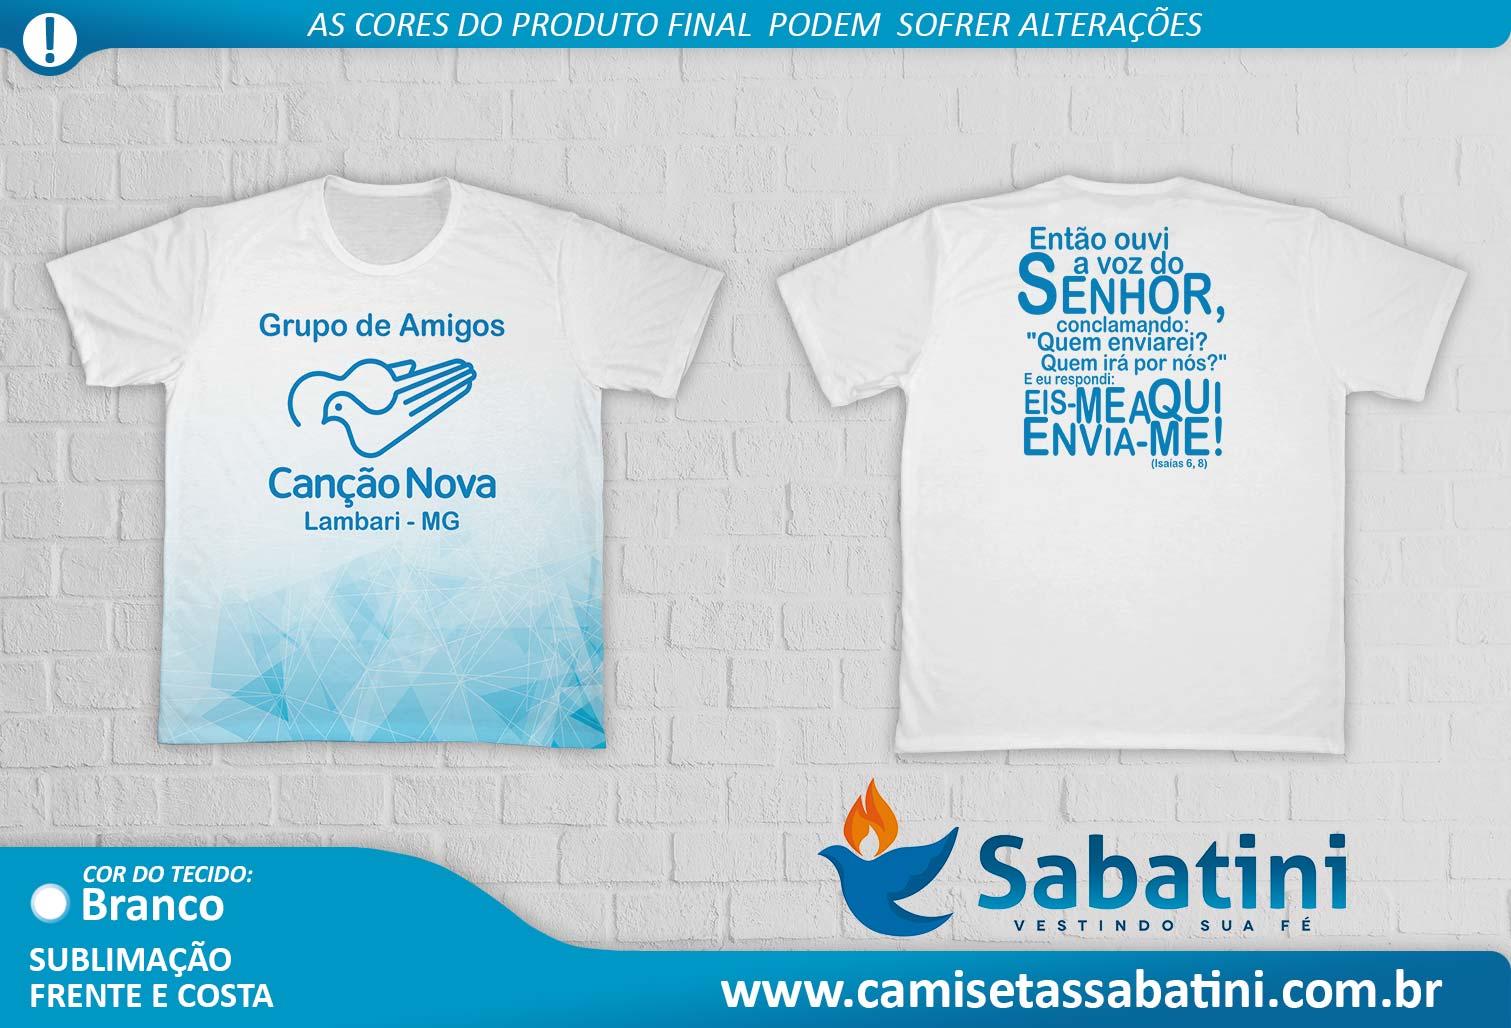 Camiseta Personalizada - GRUPO DE AMIGOS CANÇÃO NOVA- DEBORAH\MG\LAMBARI- ID15170129  - Camisetas Sabatini